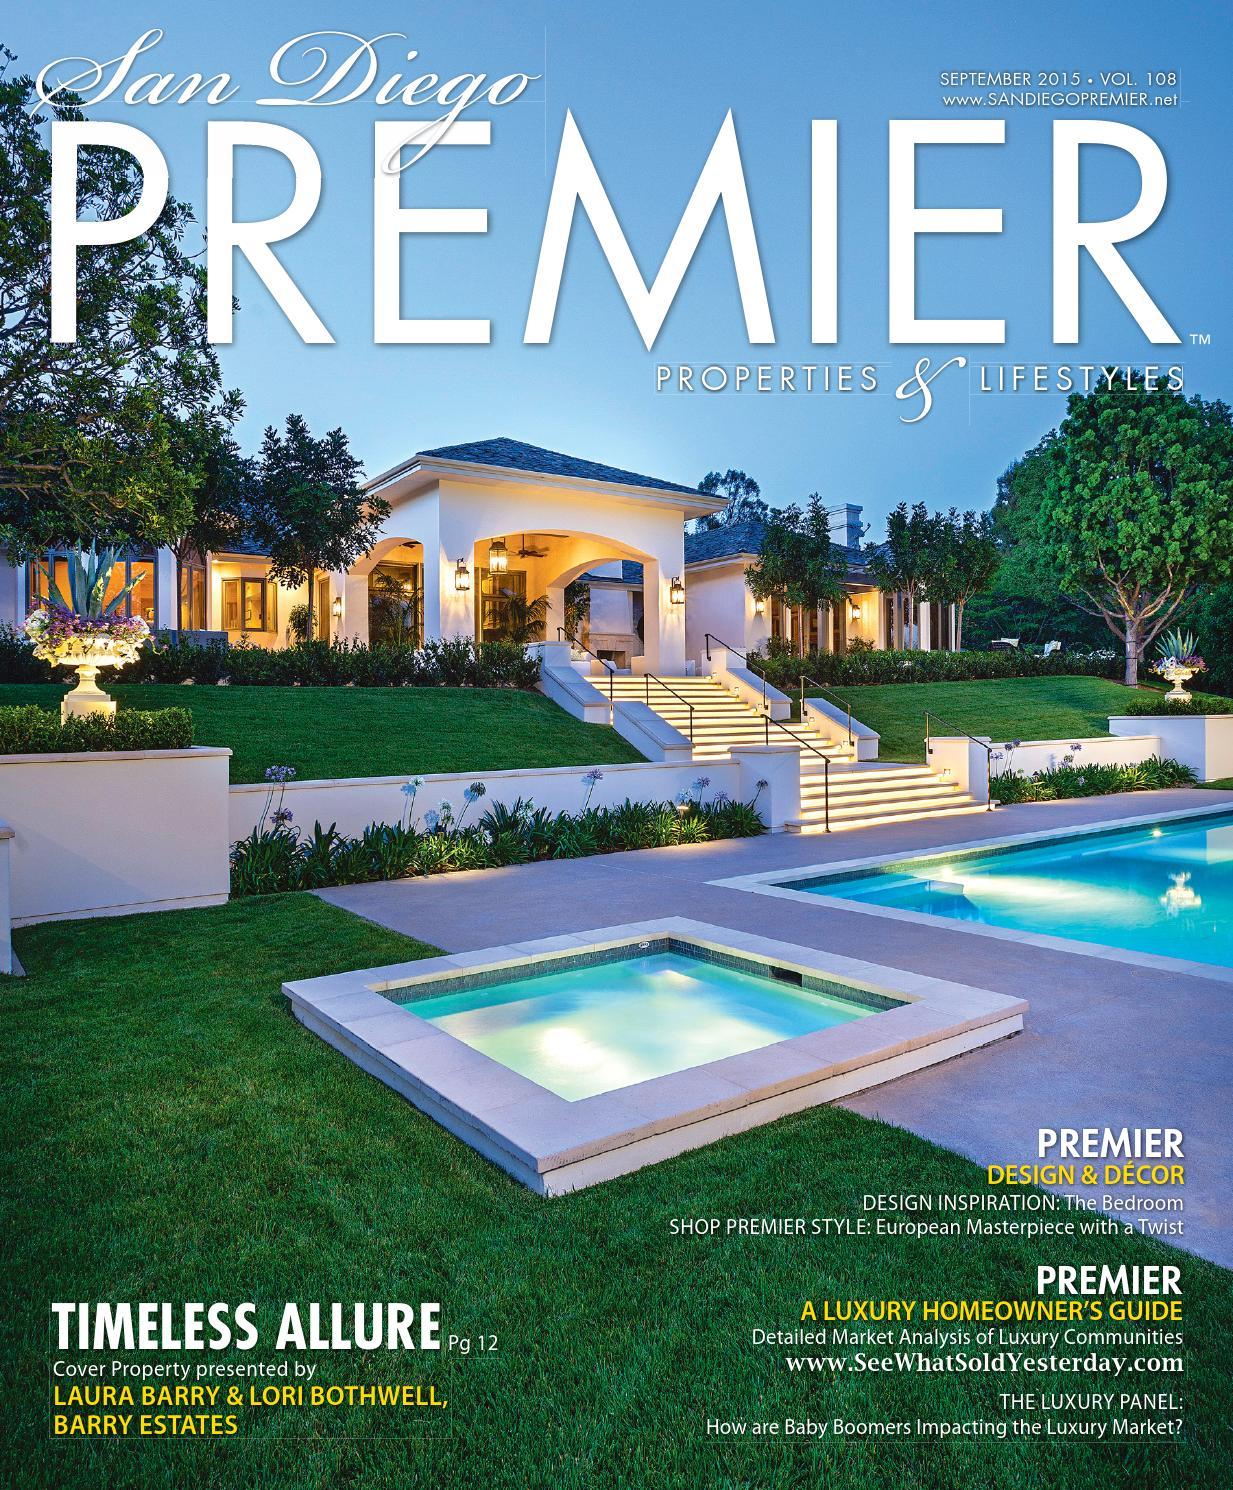 San Diego Premier 108 September 2015 by San Diego PREMIER - issuu